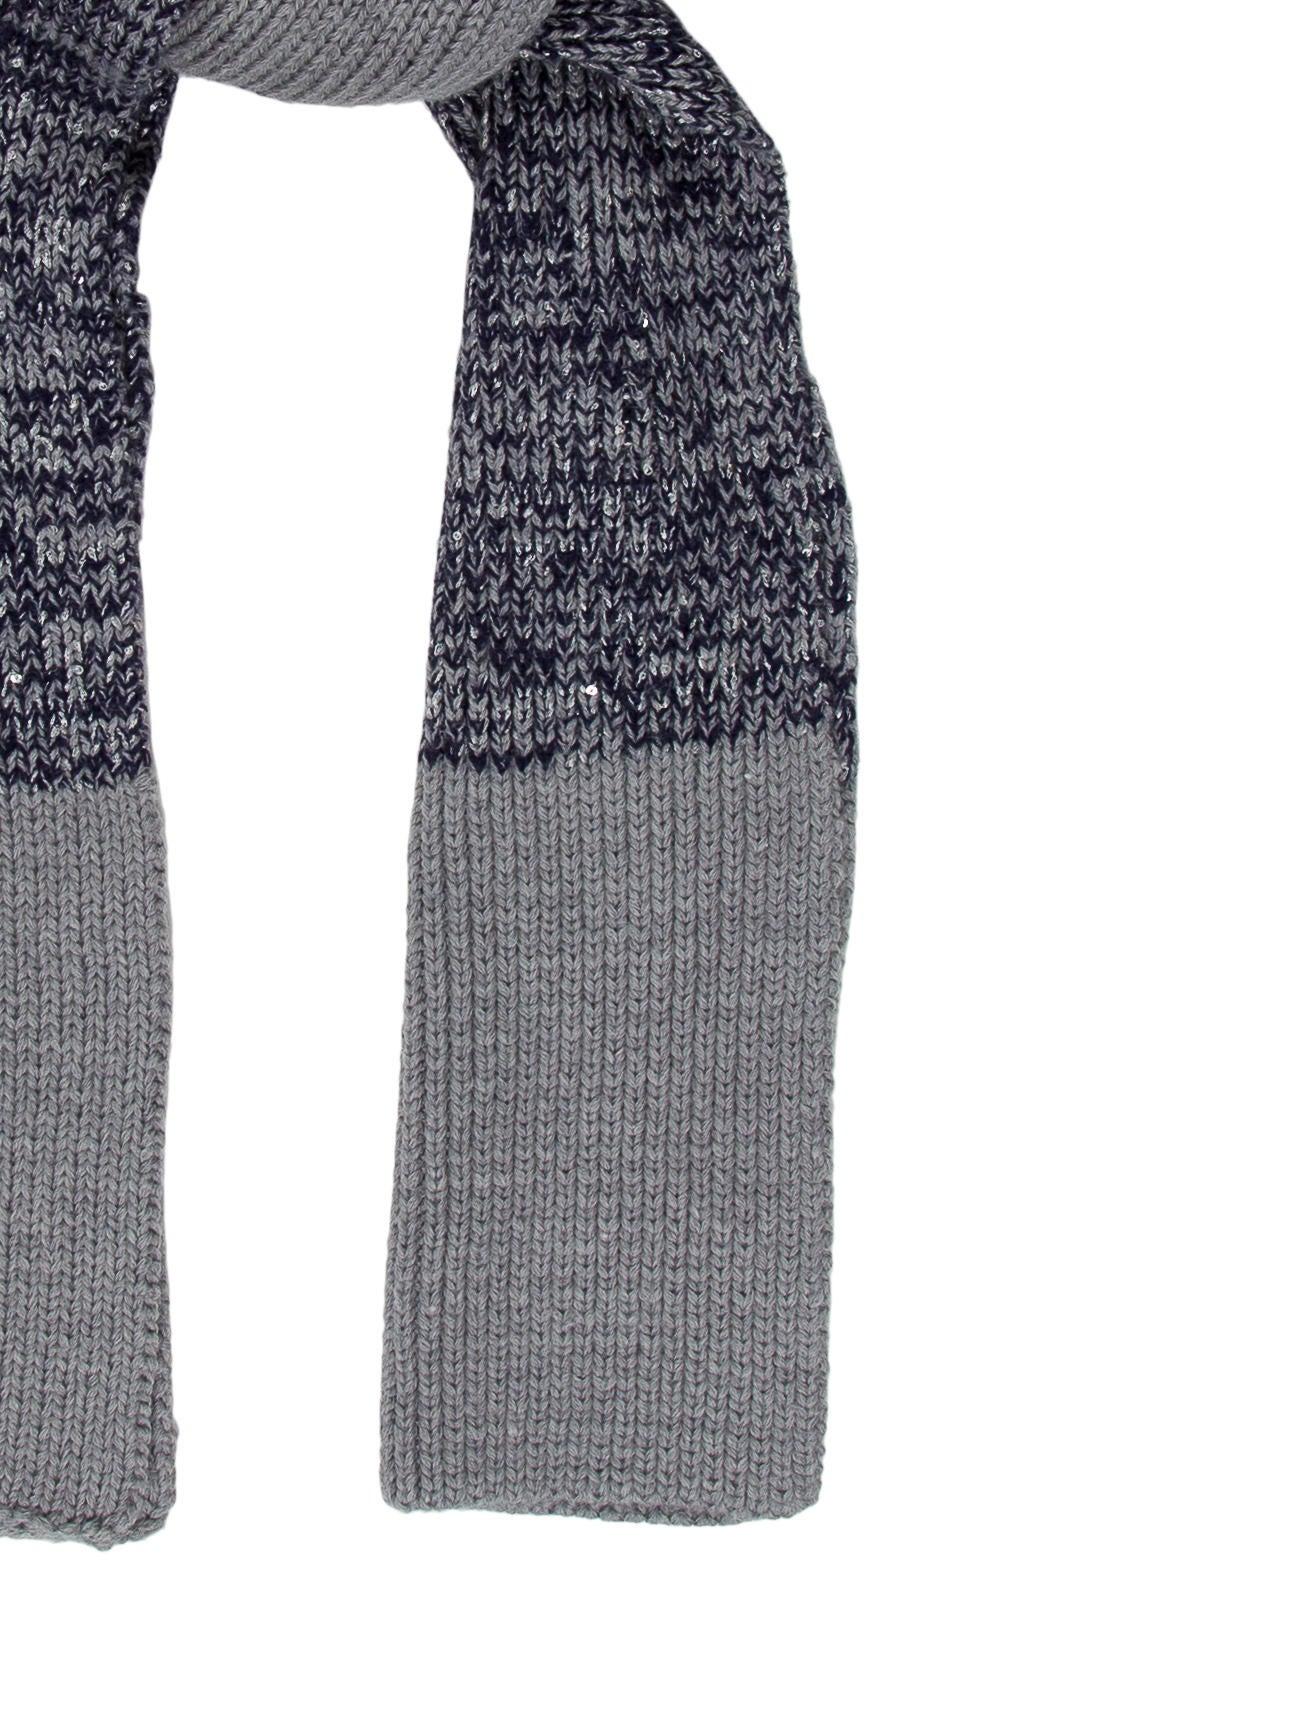 Knitting Websites Australia : Ugg australia embellished knit scarf w tags accessories